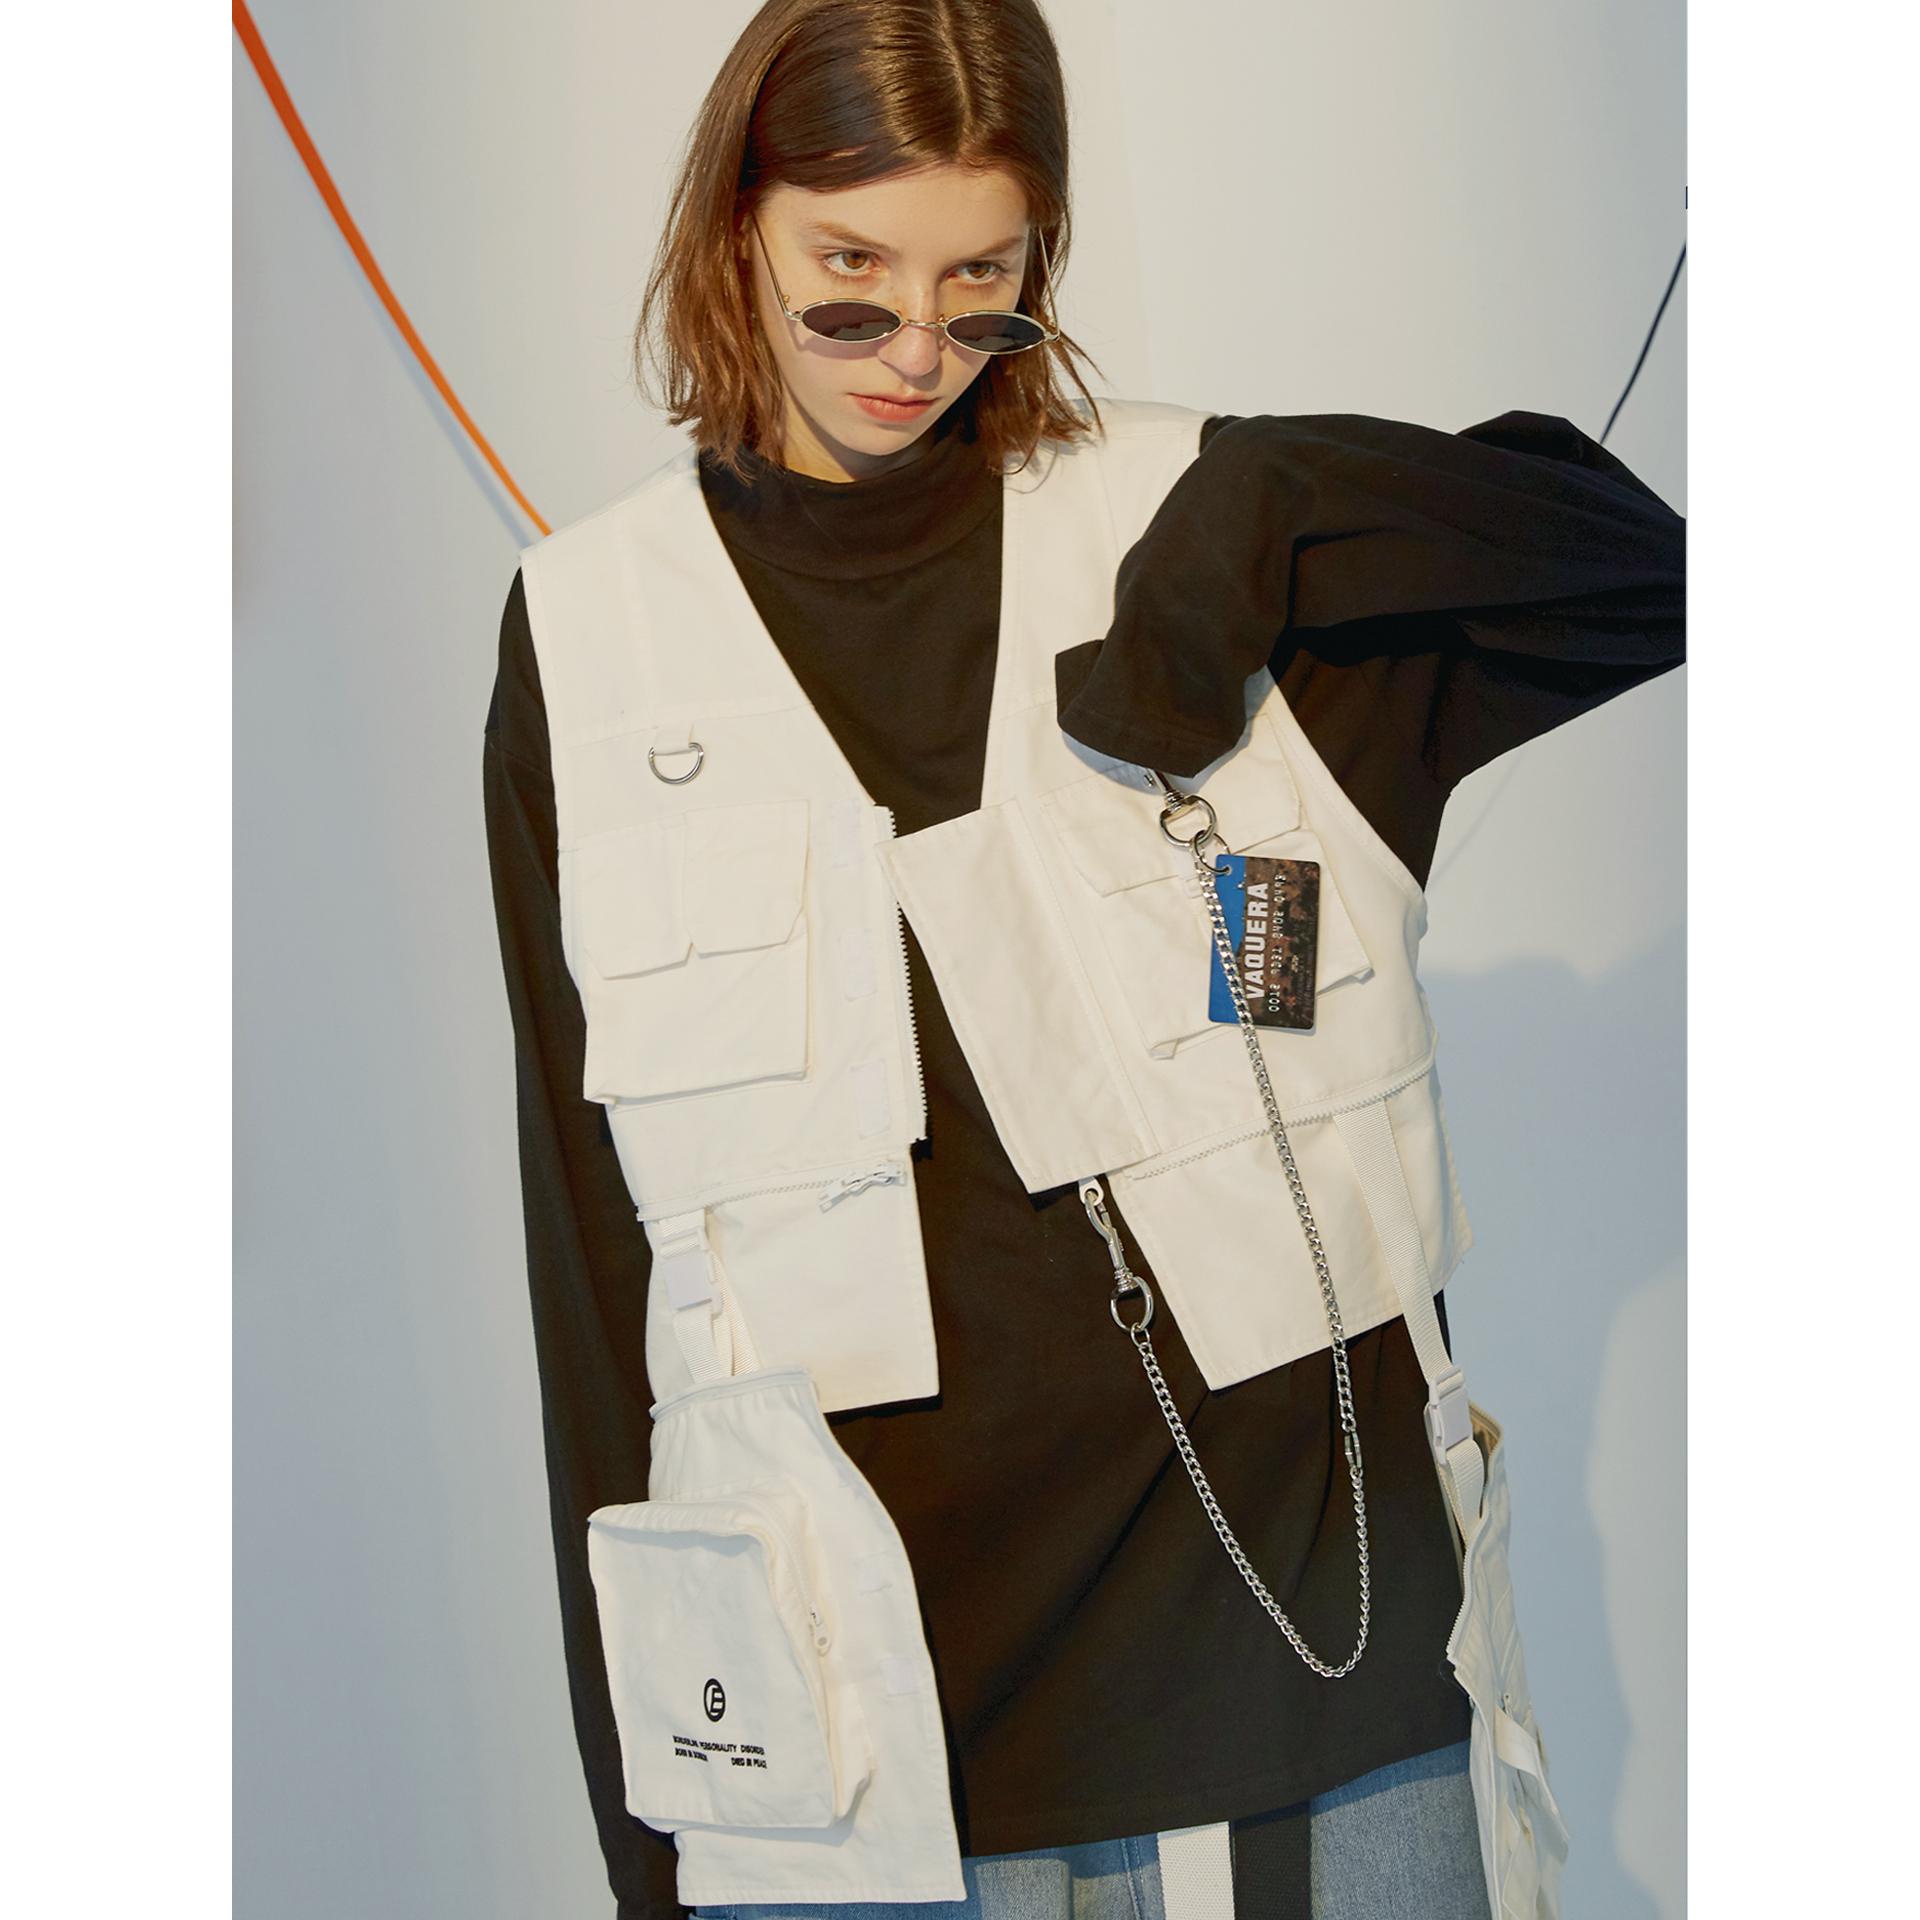 Edgender 2019 national fashion hip-hop print three-dimensional pocket detachable tactical suit vest sleeveless jacket